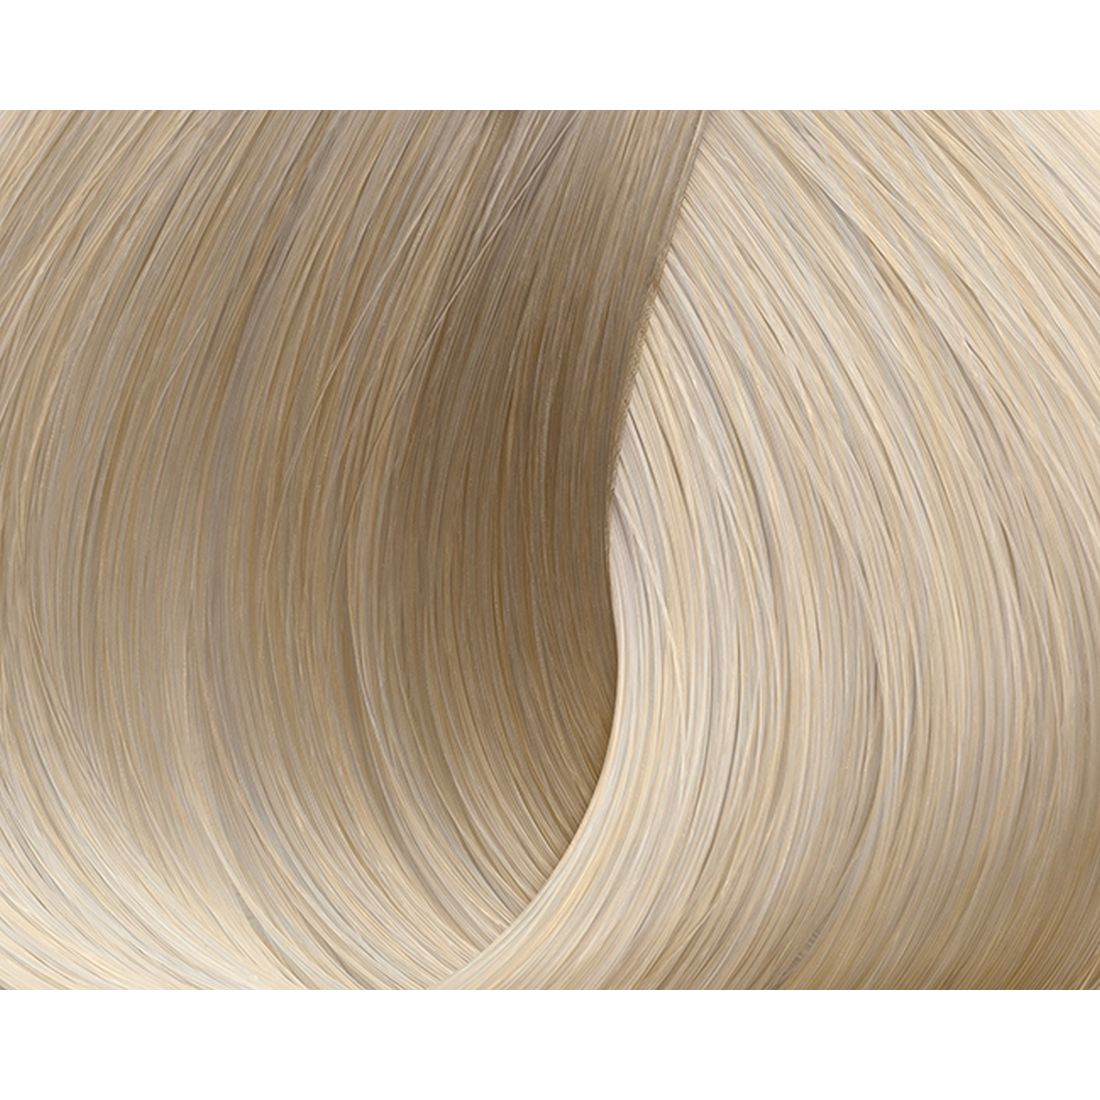 Lorvenn Beauty Color Super Blondes 1+2 Επαγγελματική Βαφή Σωληνάριο 70ml No 12.81 Extra Blond Πλατινέ Σαντρέ Έντονο No 12.81 Extra Blond Πλατινέ Σαντρέ Έντονο